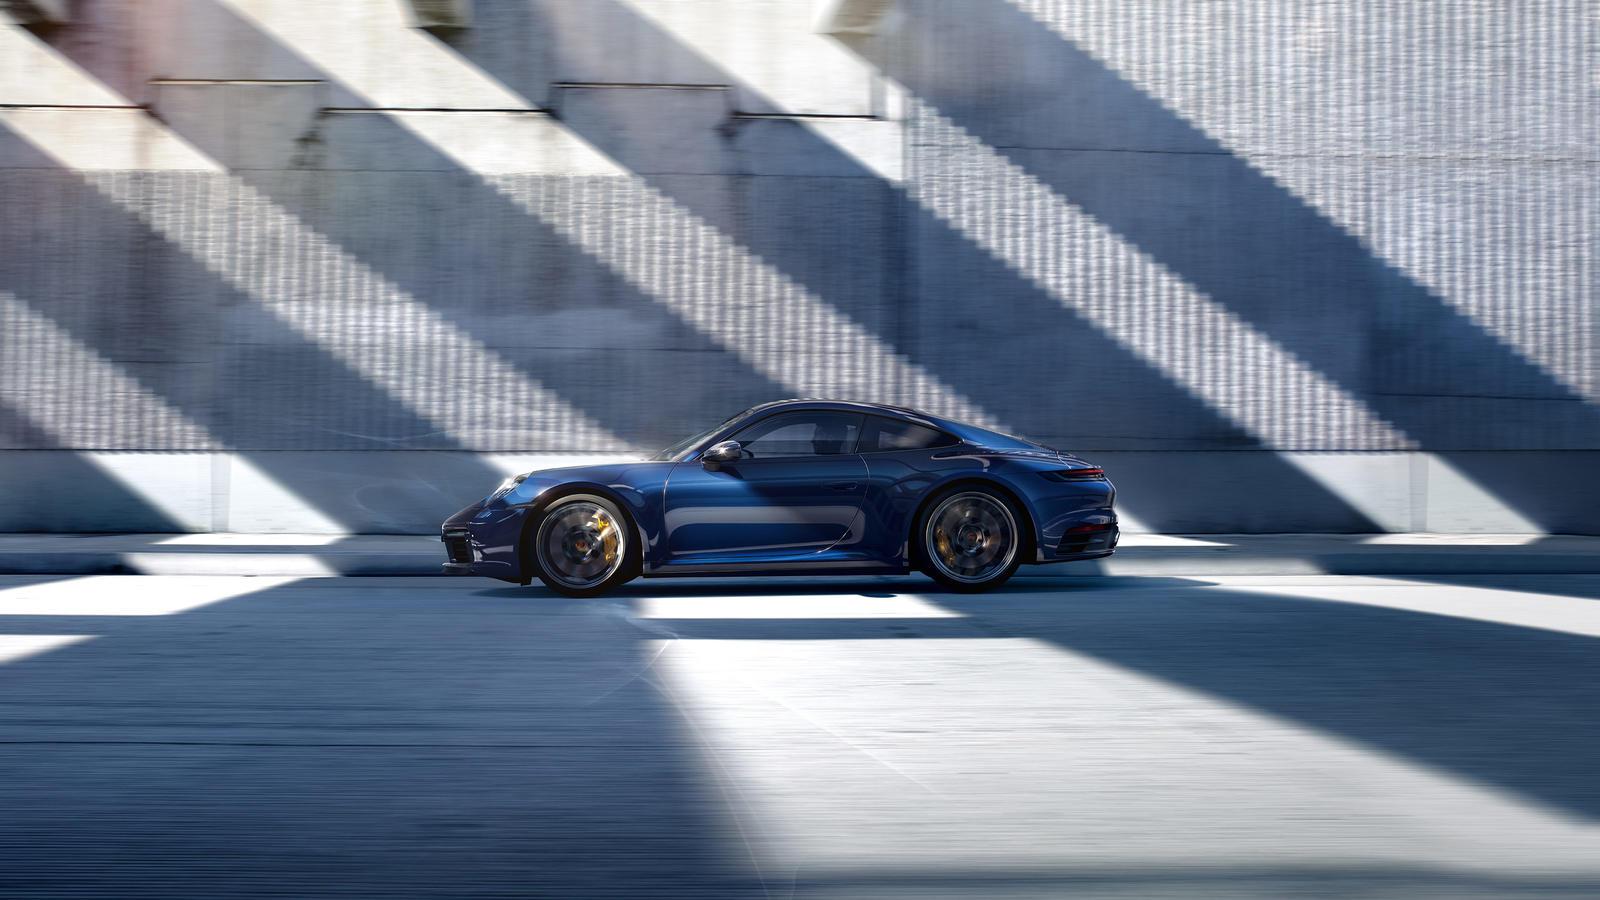 Porsche - 911 Carrera 4S Coupe - Вне времени